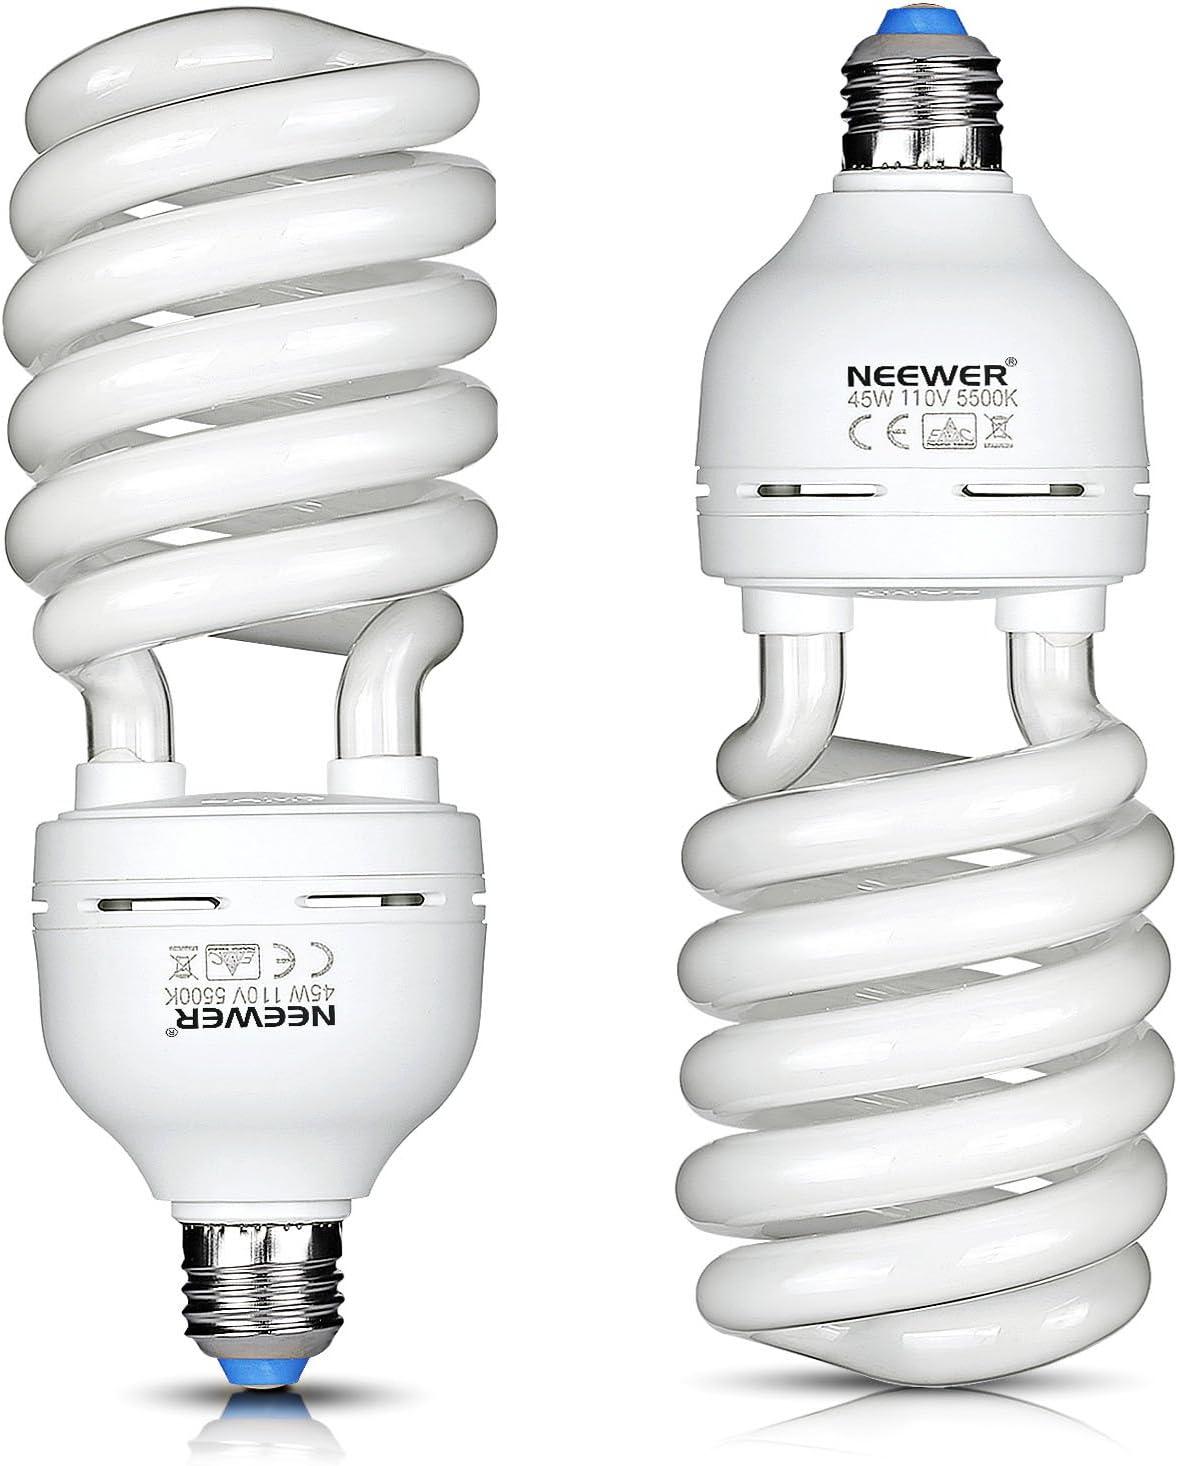 Neewer 45W 110V 5500K Tri-phosphor Spiral CFL Daylight Balanced Light Bulb in E27 Socket for Photo and Video Studio Lighting 2 Pack